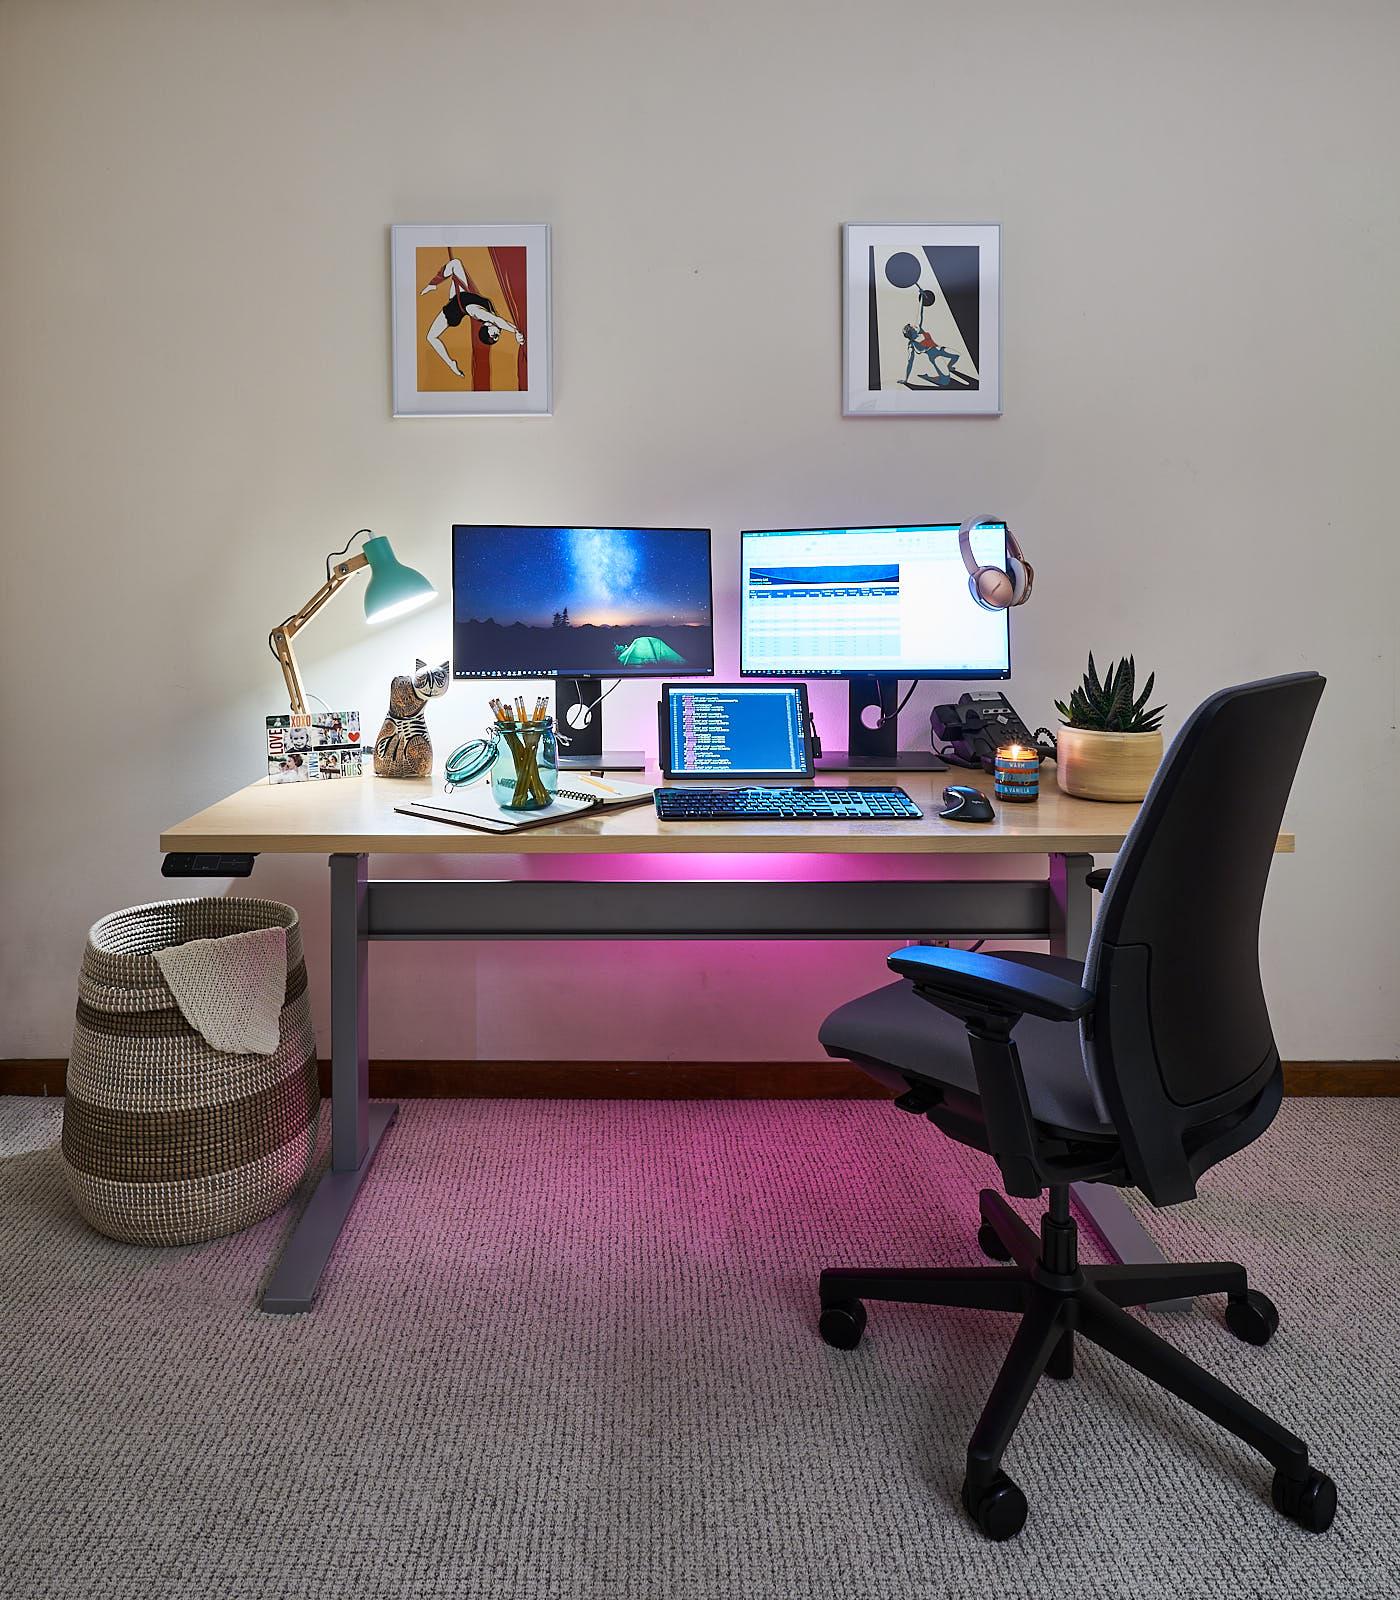 "30"" x 68"" Hardrock Maple Laminate Top with Silver VertDesk Standing Desk Frame"